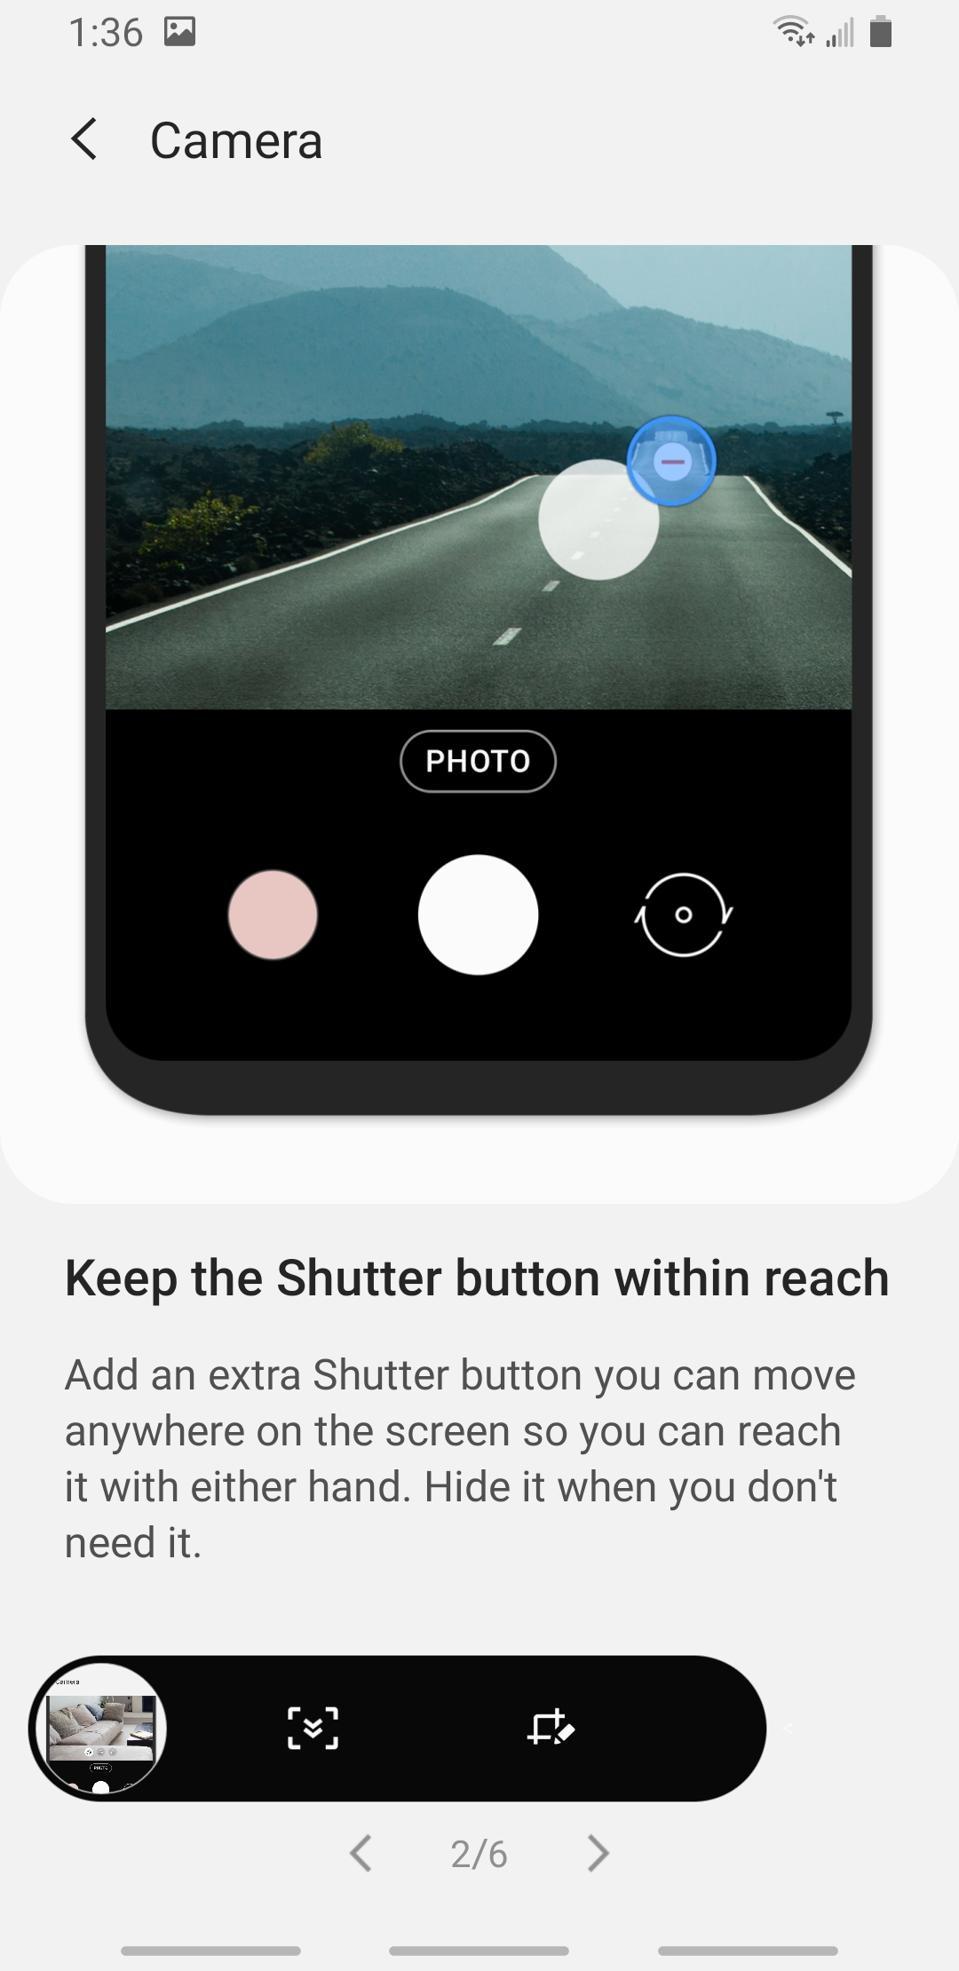 Samsung Android v10 Upgrade Options for Smartphone Camera